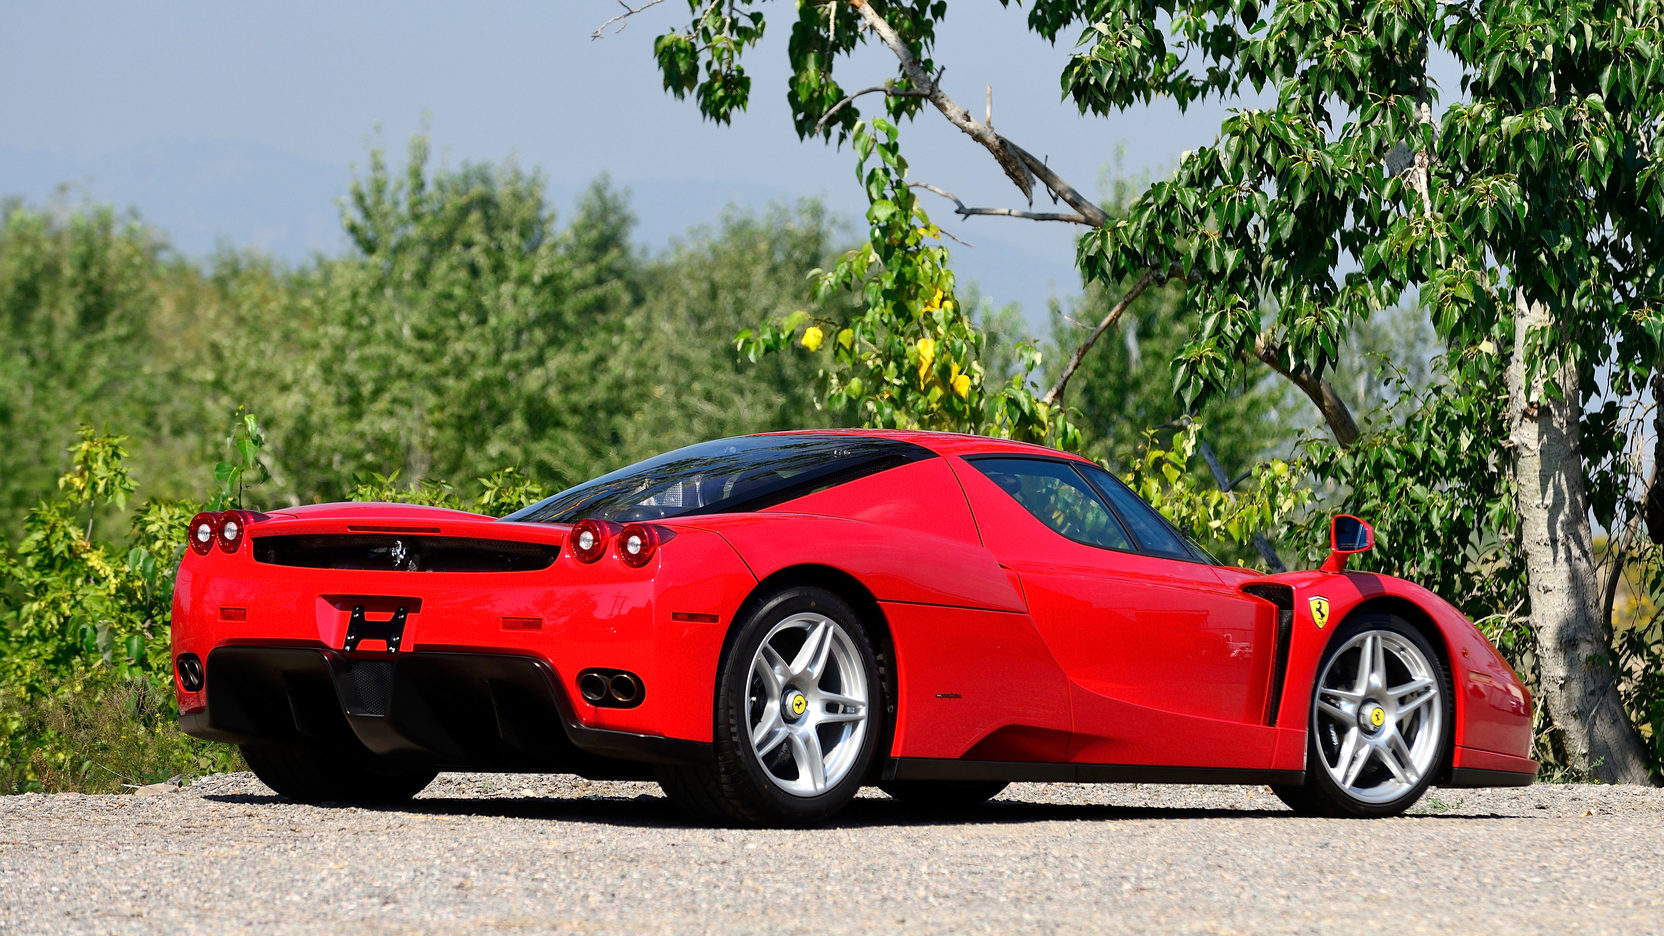 Car Shop Wallpaper 2003 Ferrari Enzo S108 1 Monterey 2016